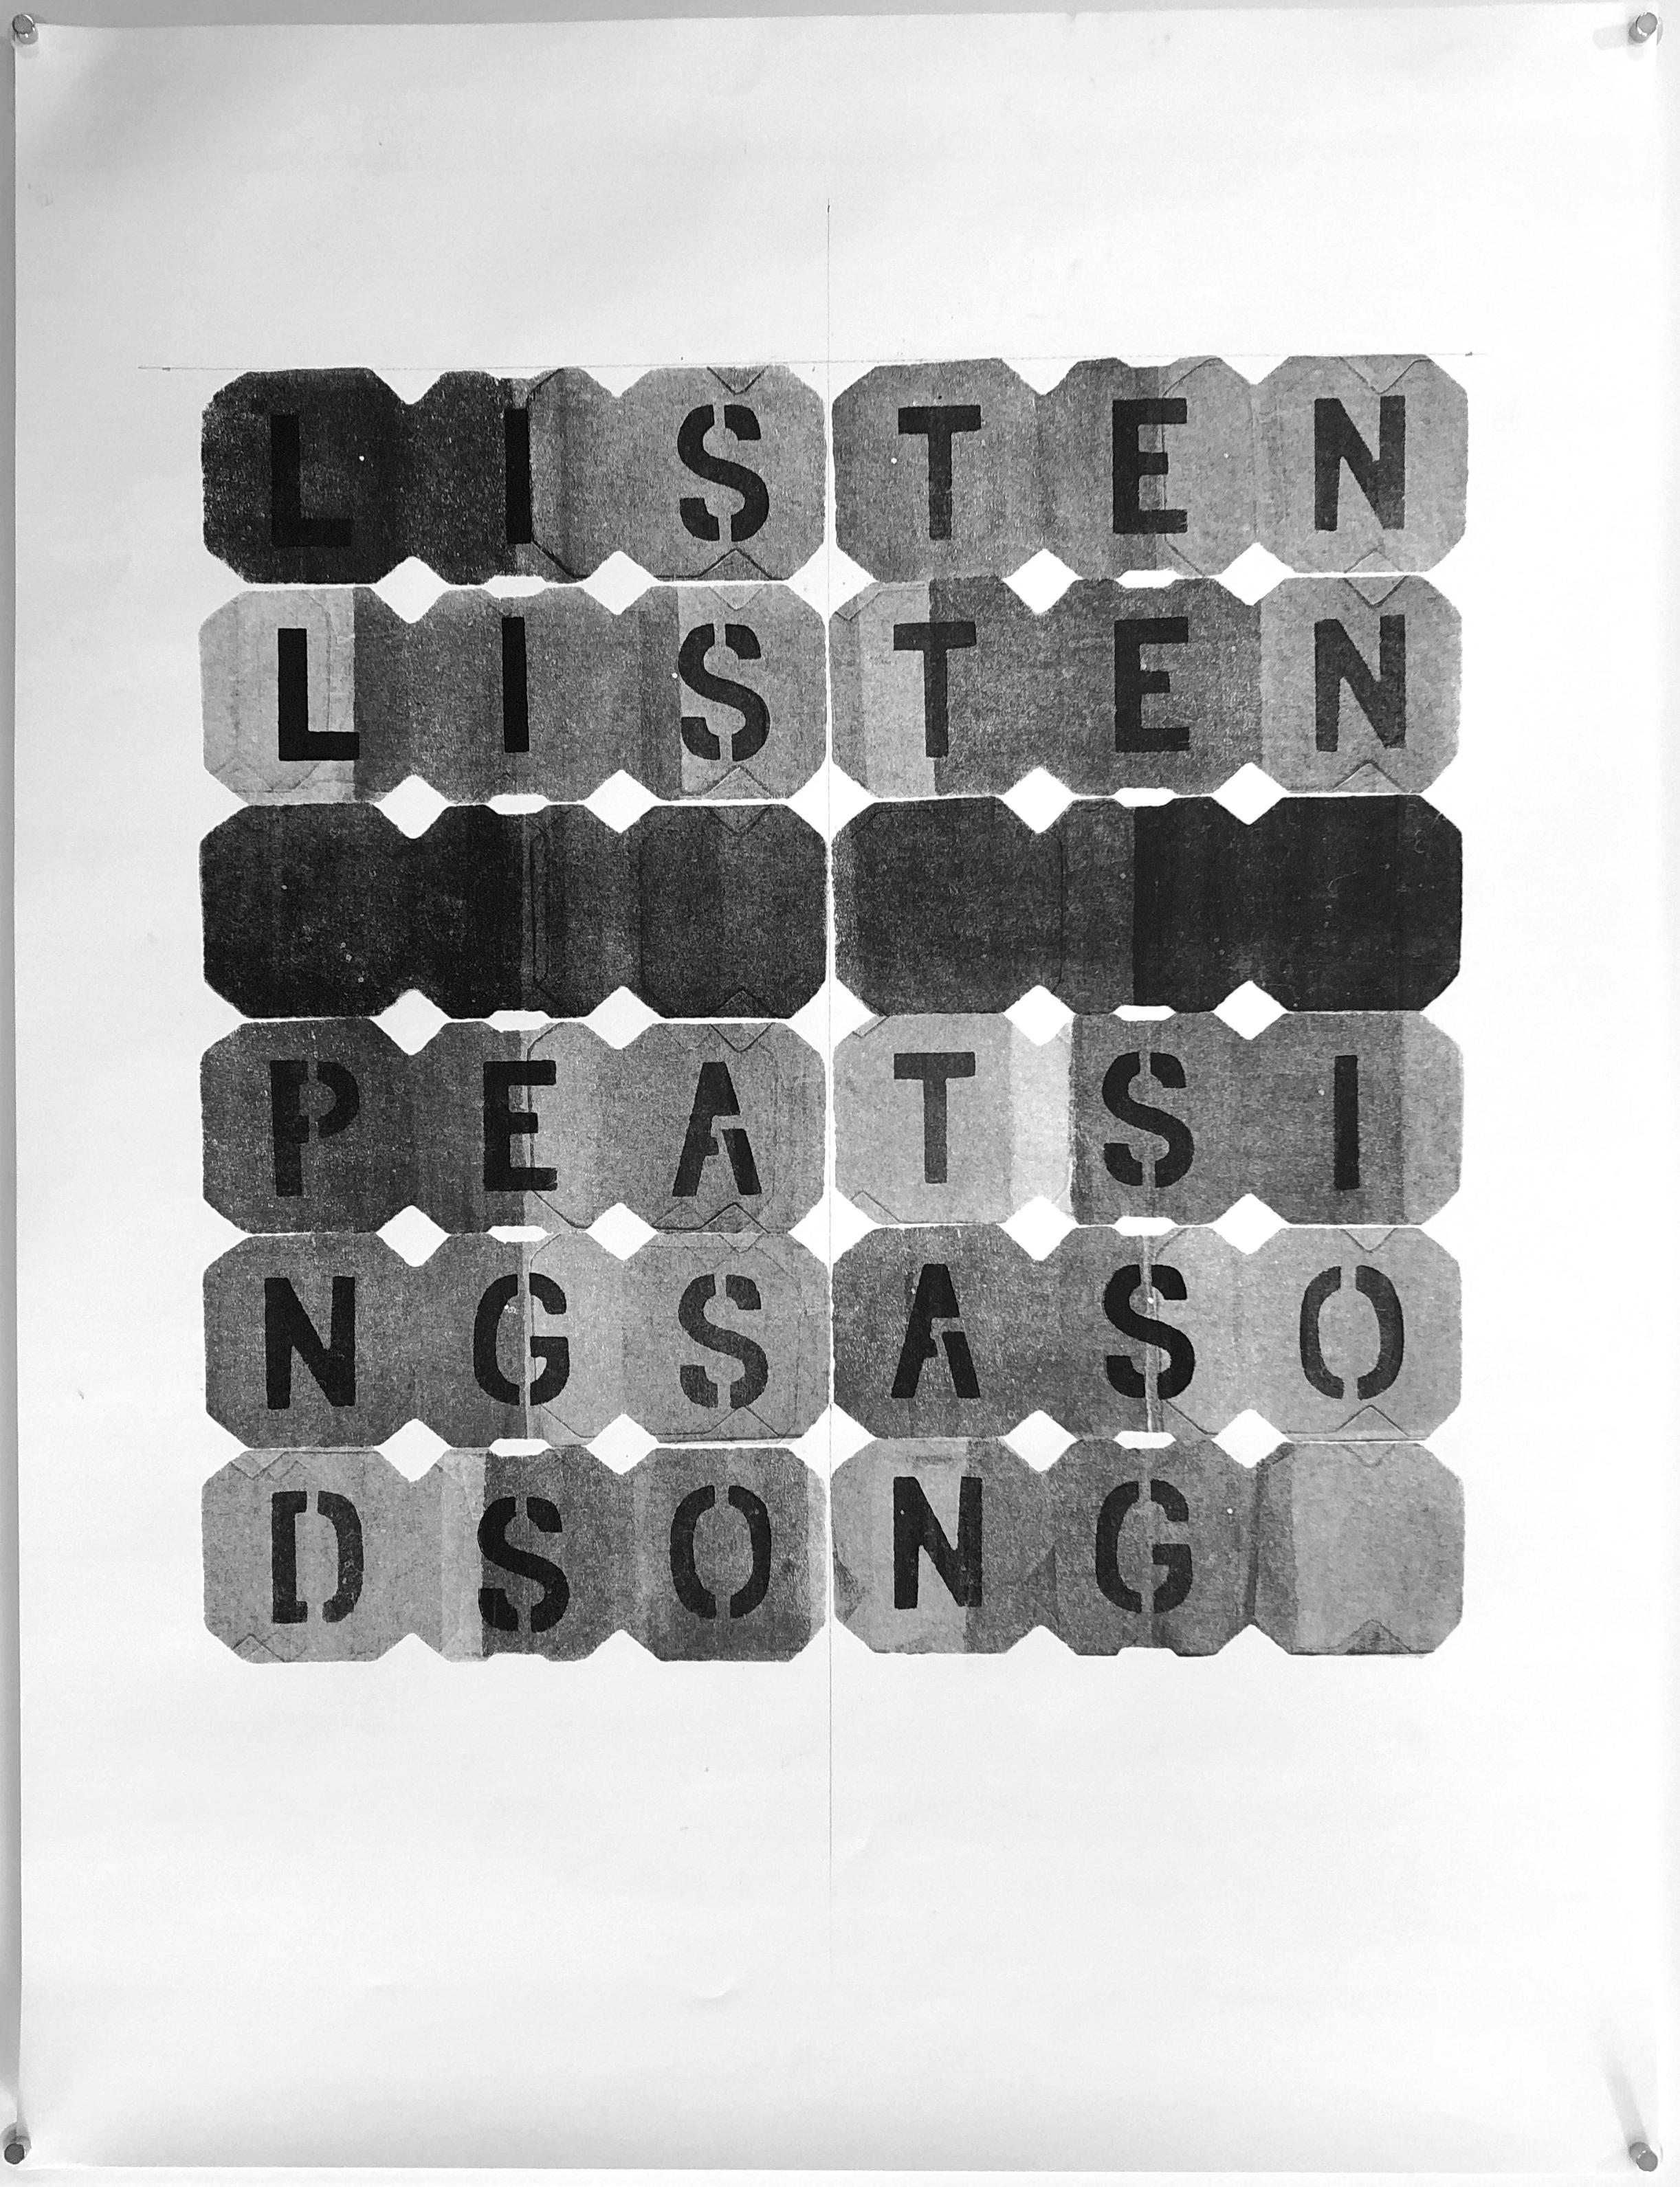 "LISTEN - 2018, acrylic on paper, hand-cut stencil. 25"" x 19"""